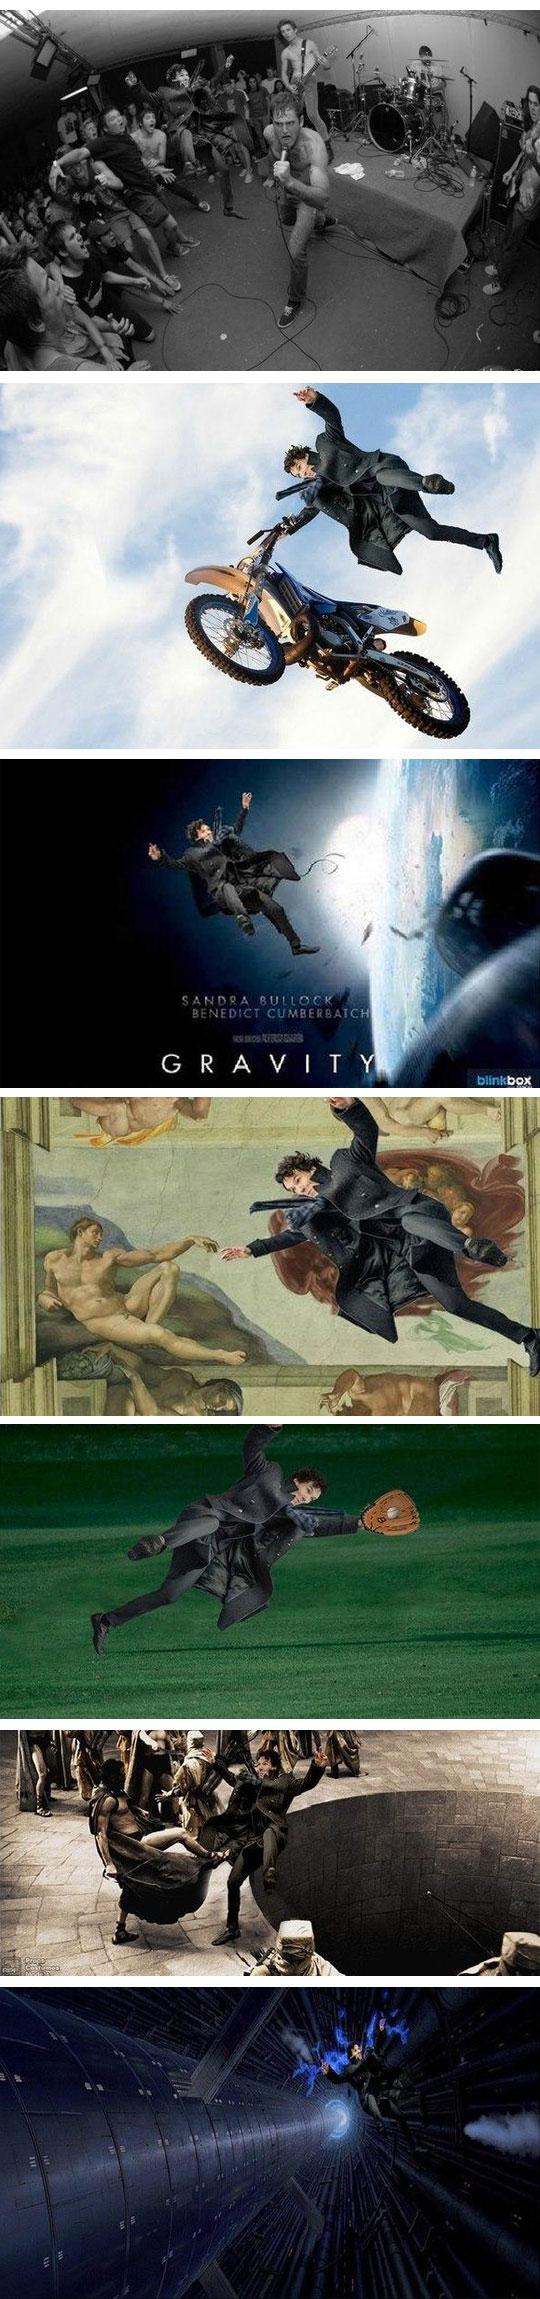 funny-Sherlock-falling-photoshop-movies